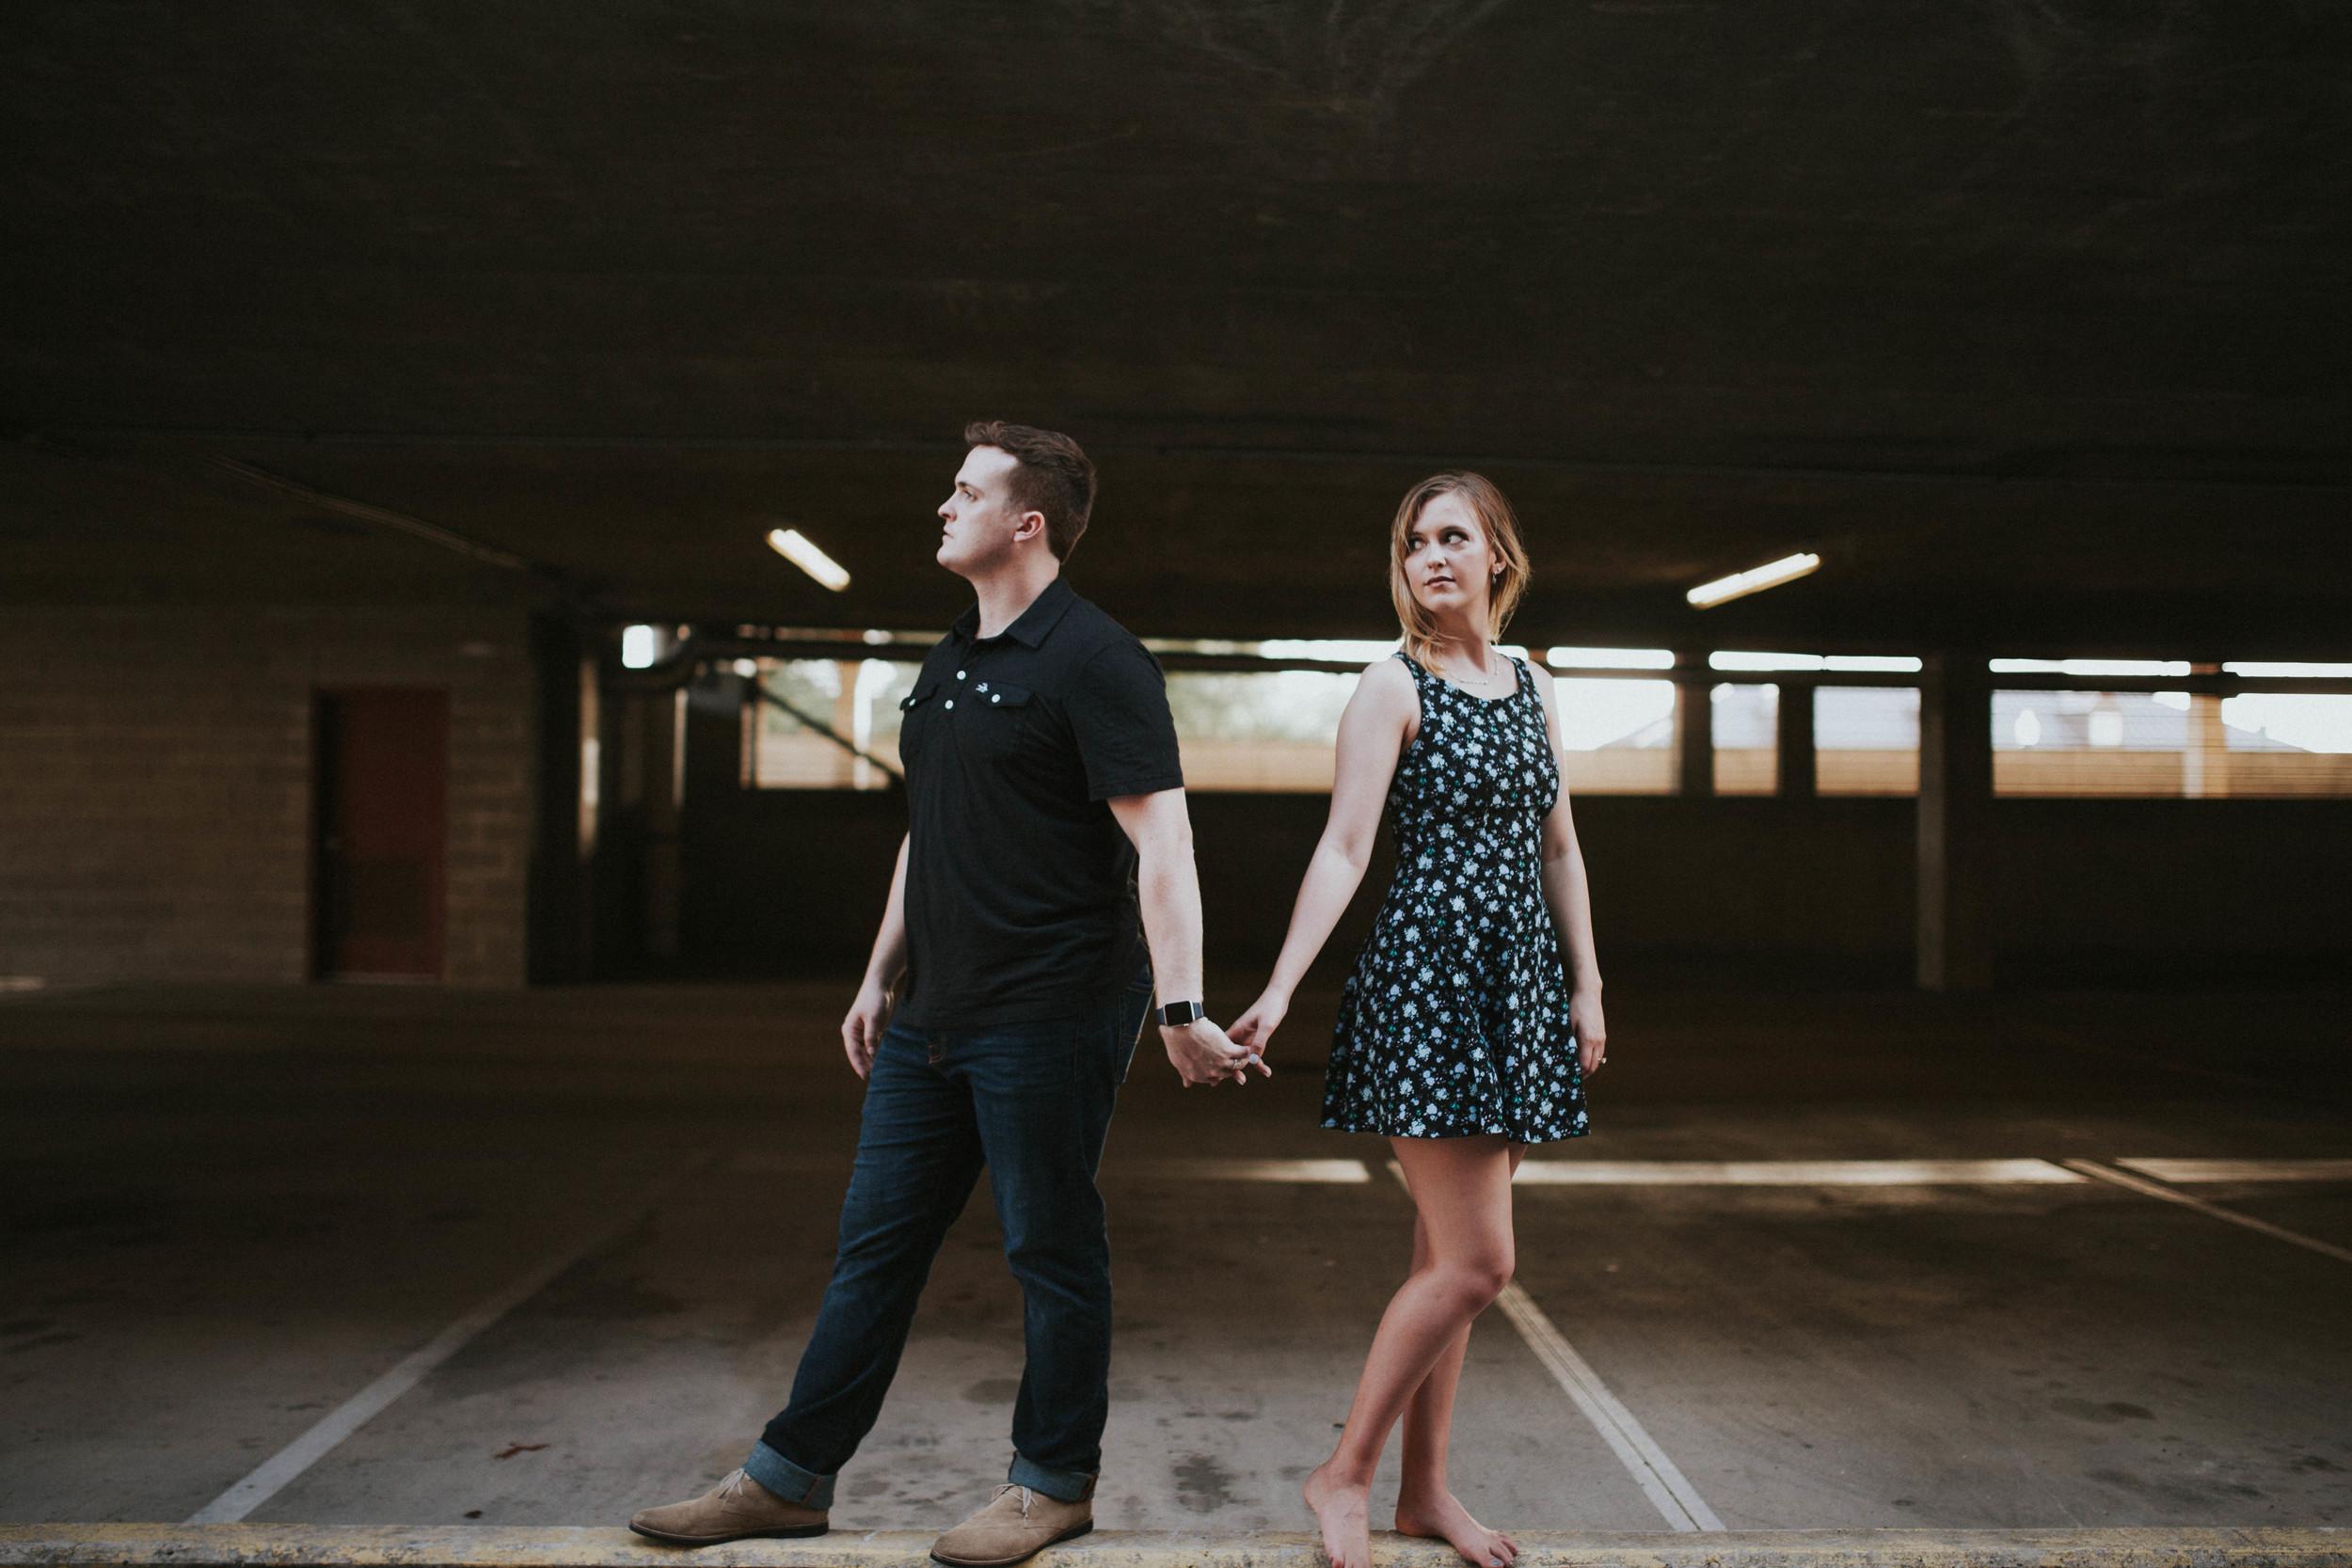 houston engagement photography-1058.jpg